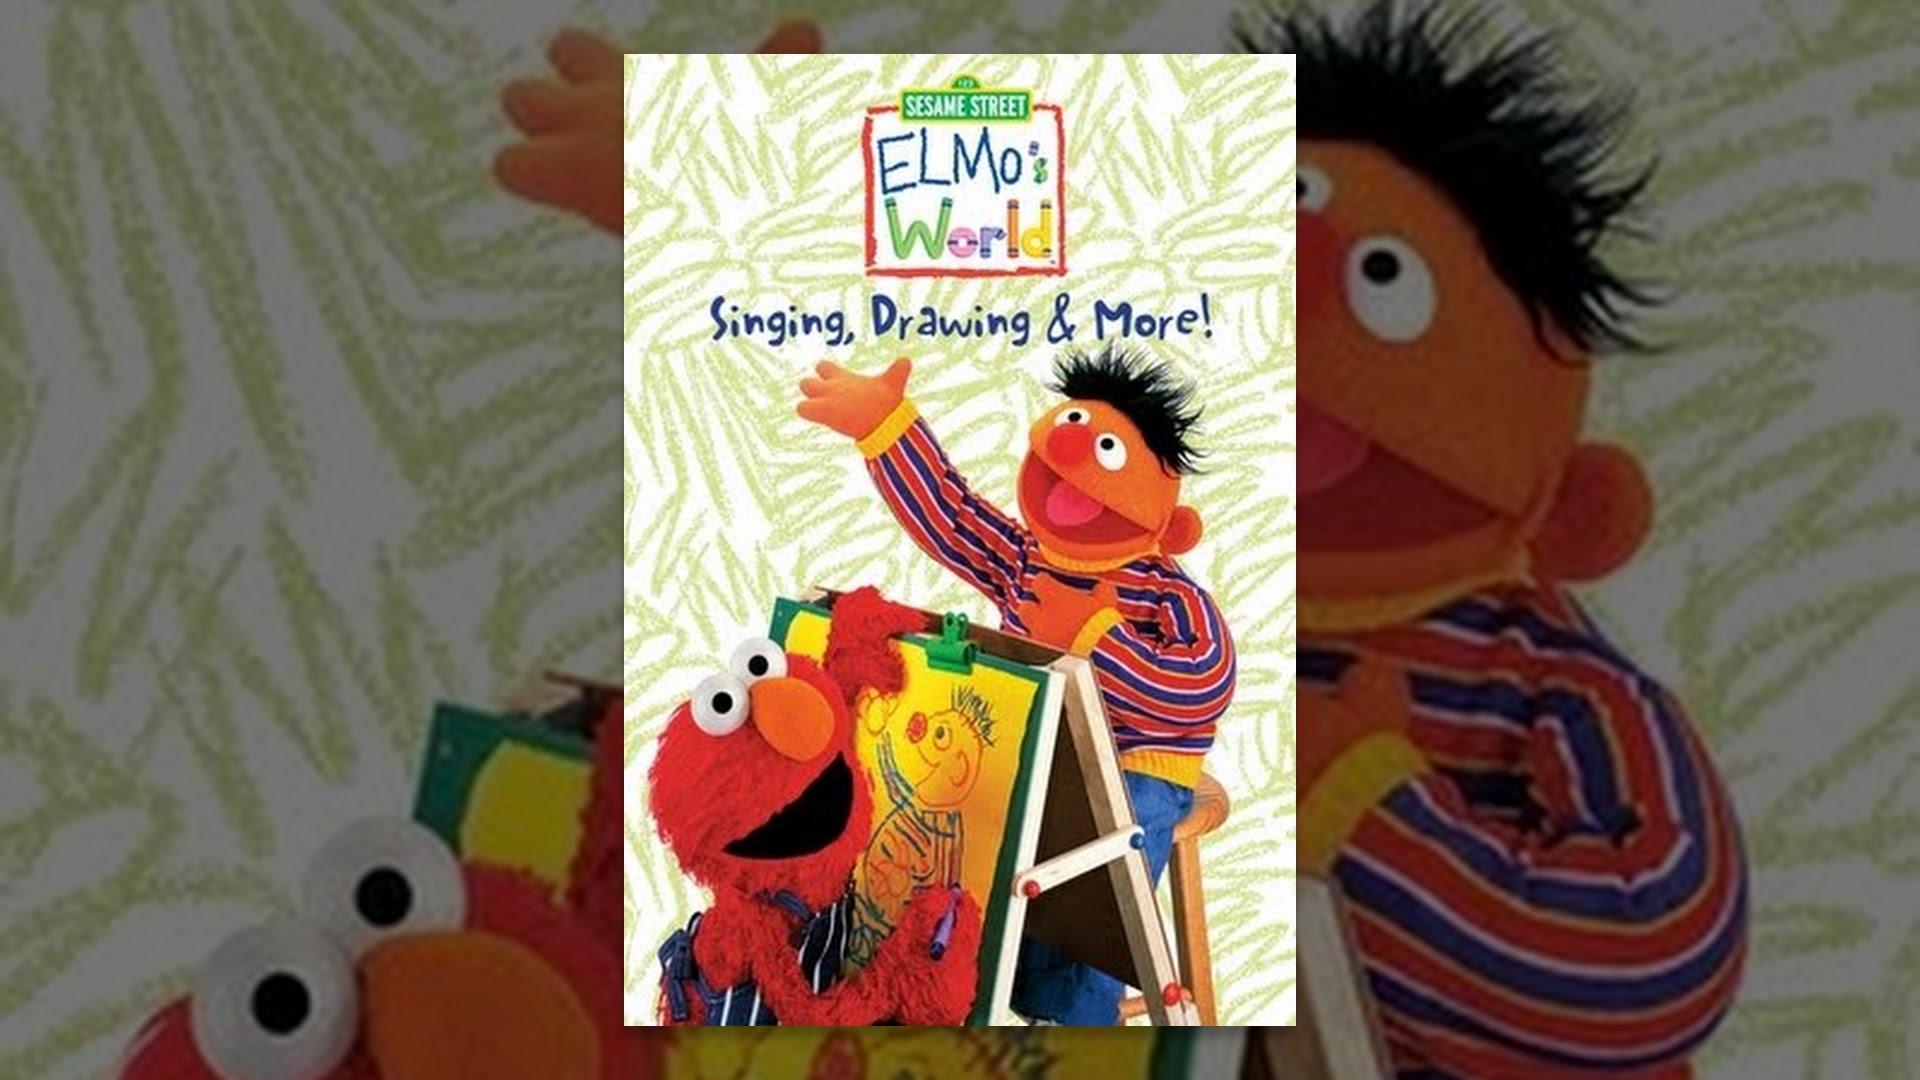 Sesame Street Elmo S World Singing Drawing More